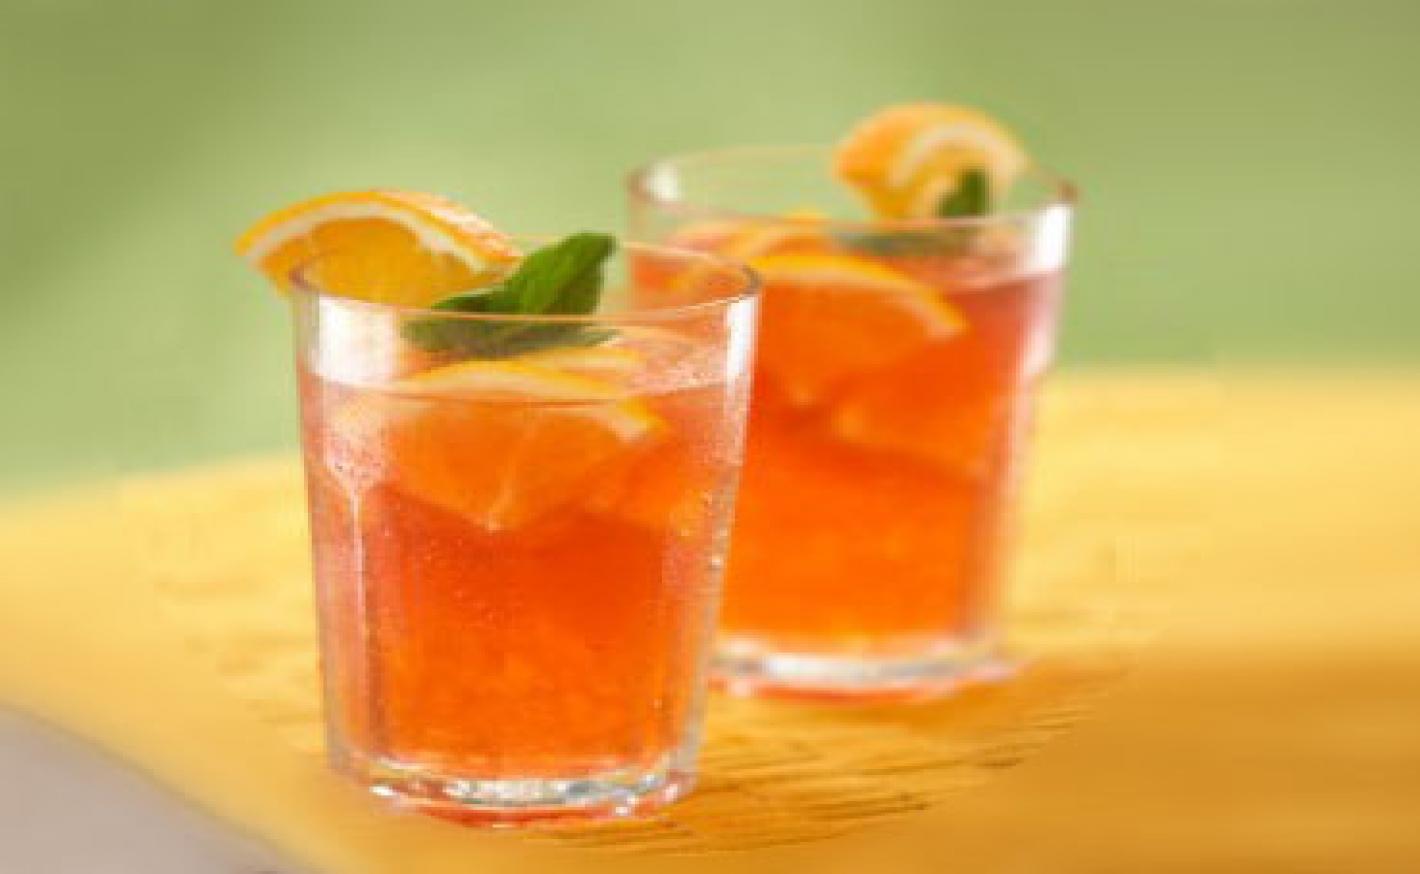 Orangen-Minz-Bowle